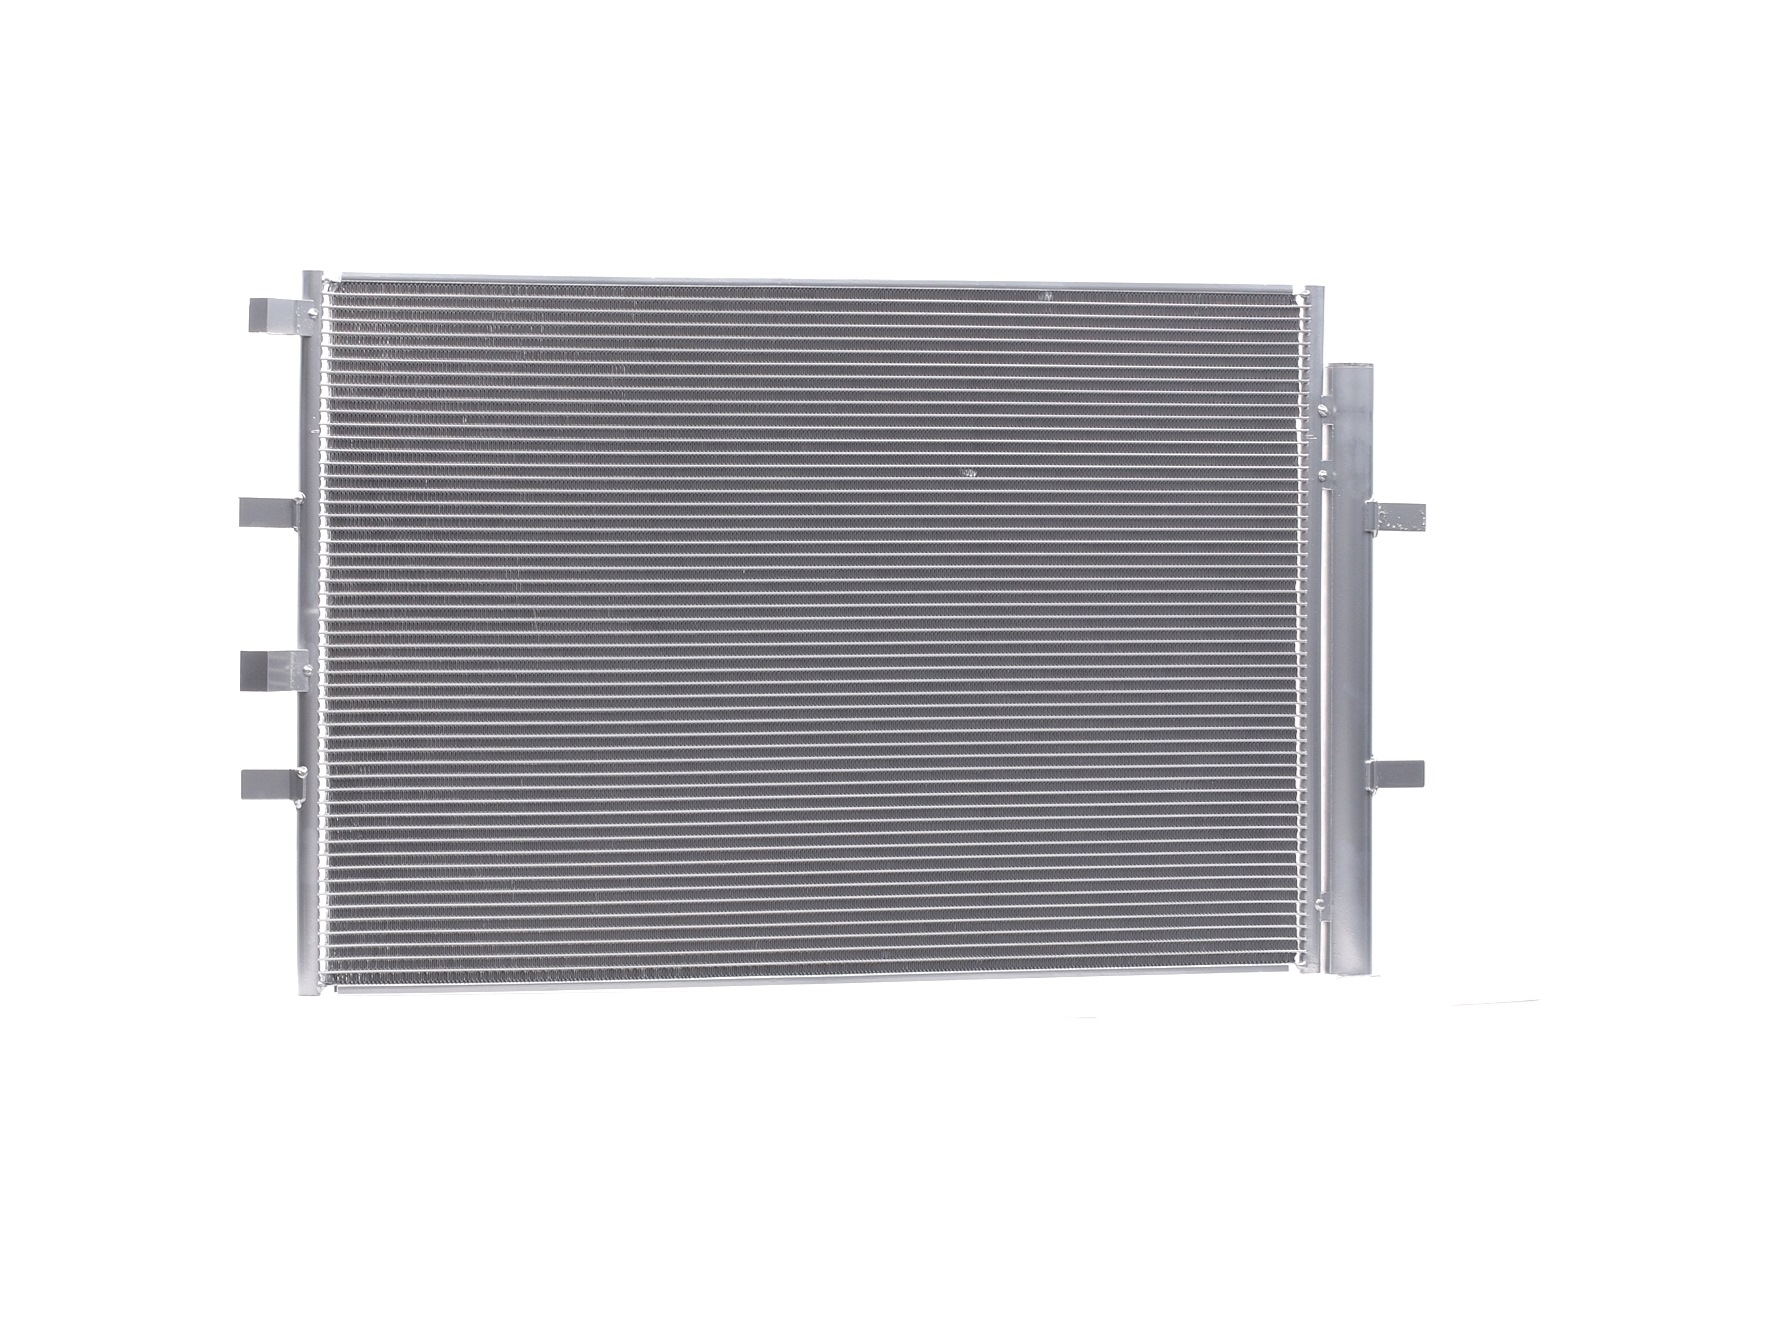 RIDEX: Original Klimakühler 448C0318 (Kältemittel: R 134a, Netzmaße: 717 x 467 x 16 mm)